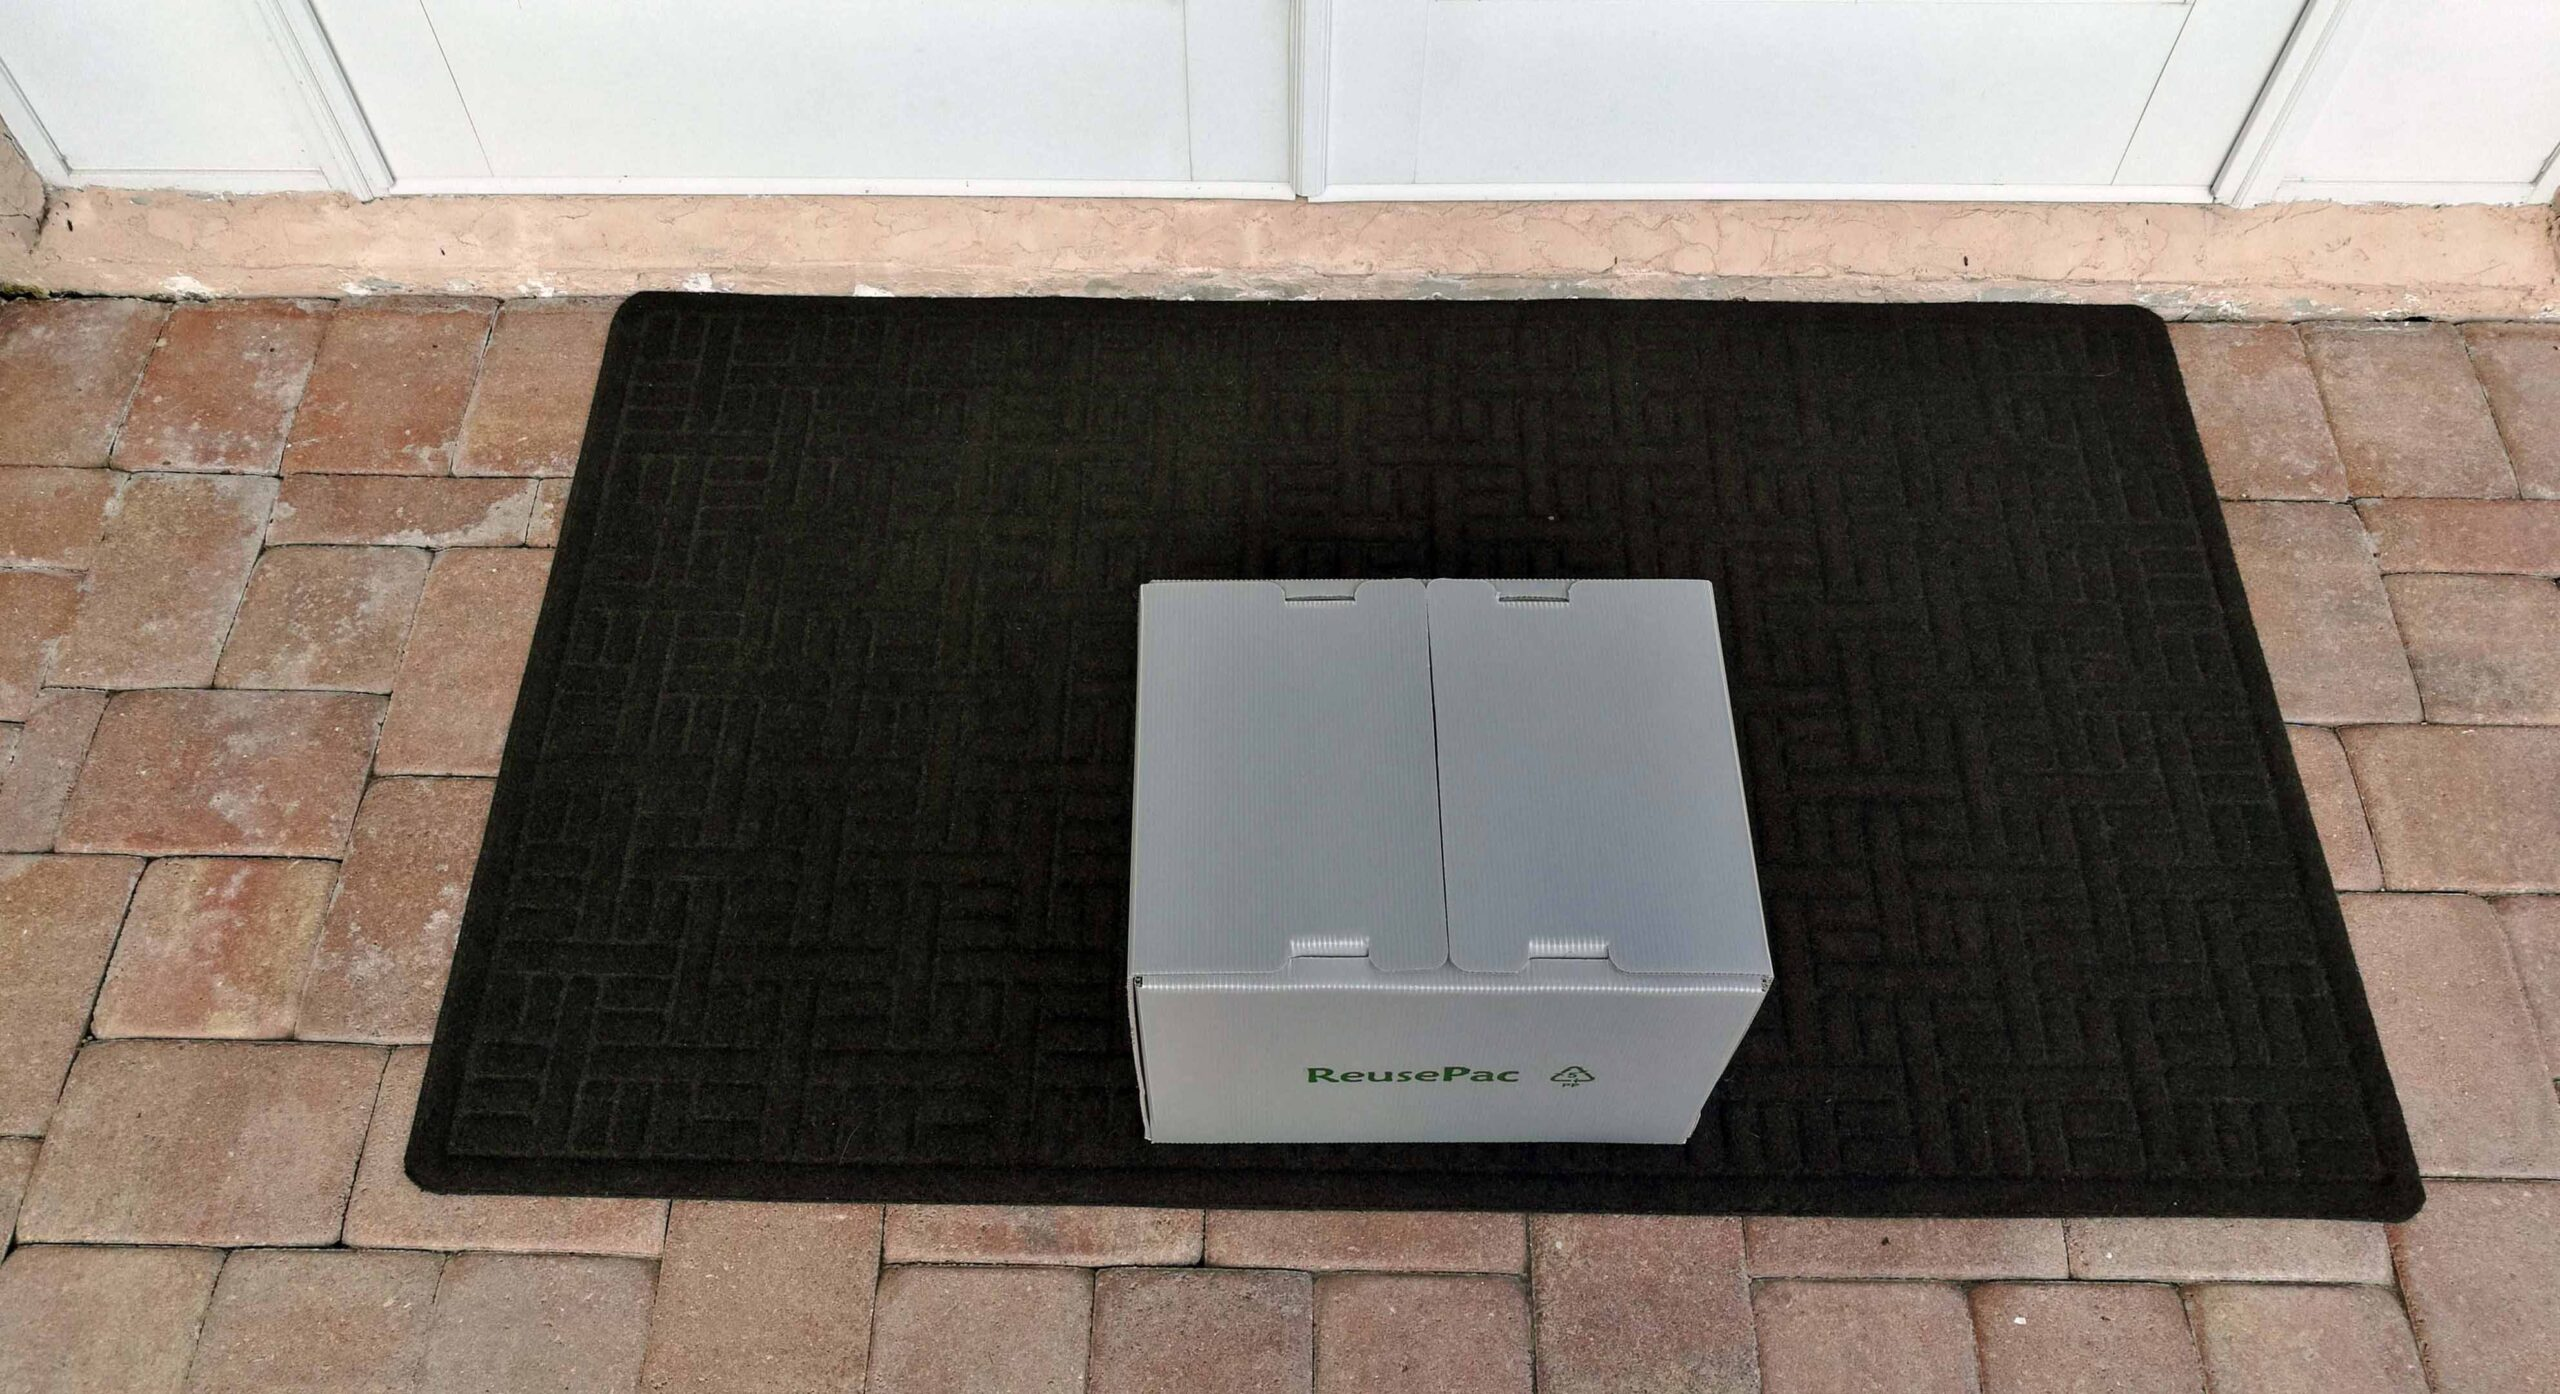 ReusePac reusable eCommerce boxes